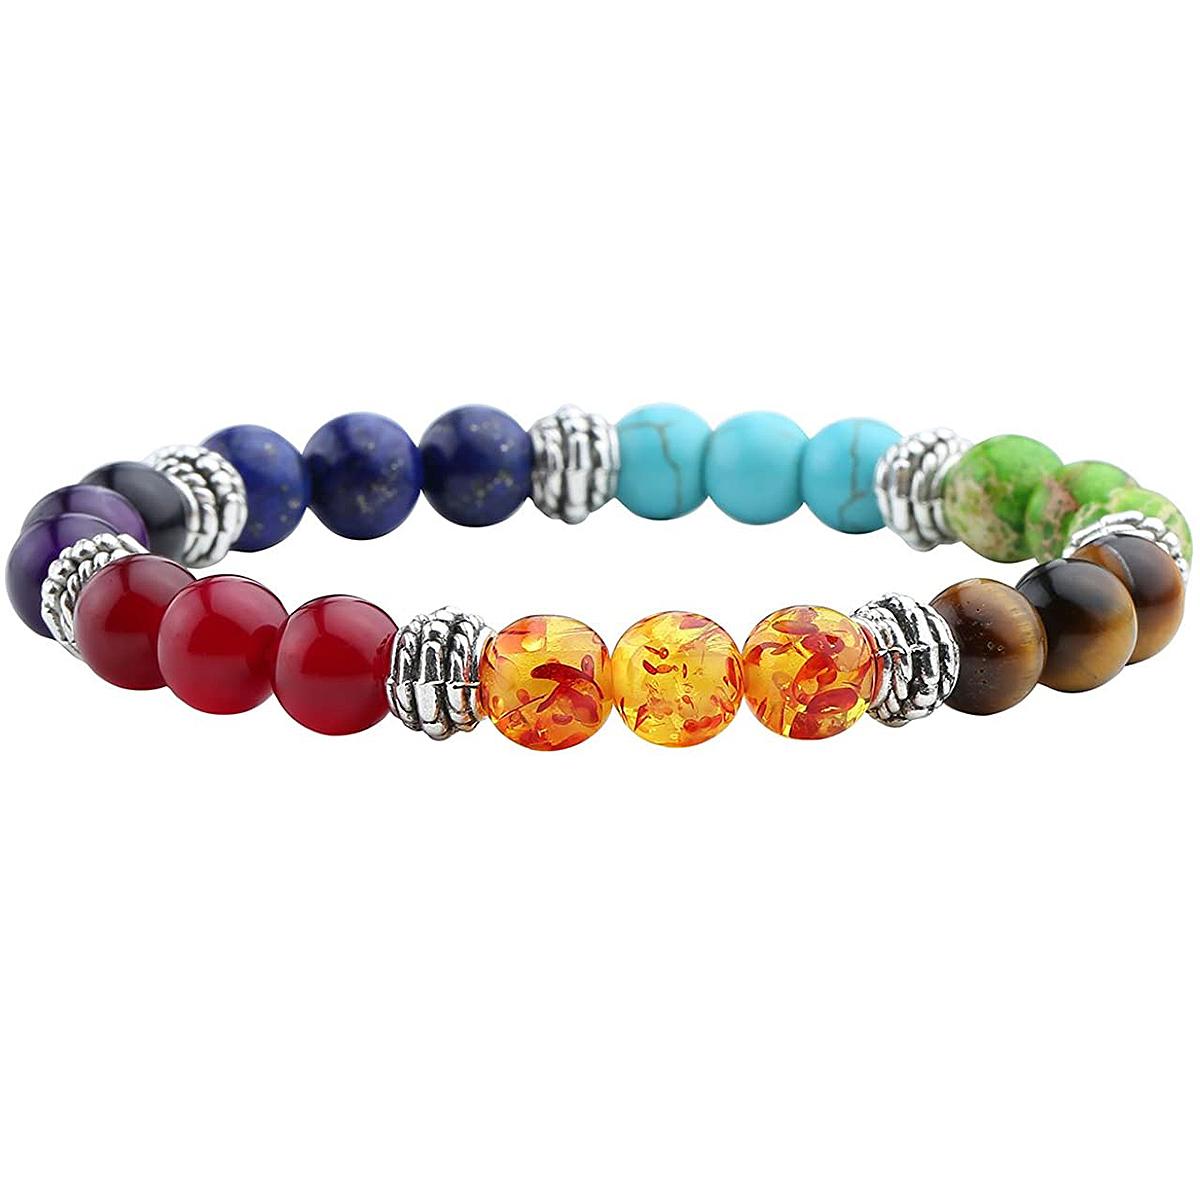 7-chakras-bracelet